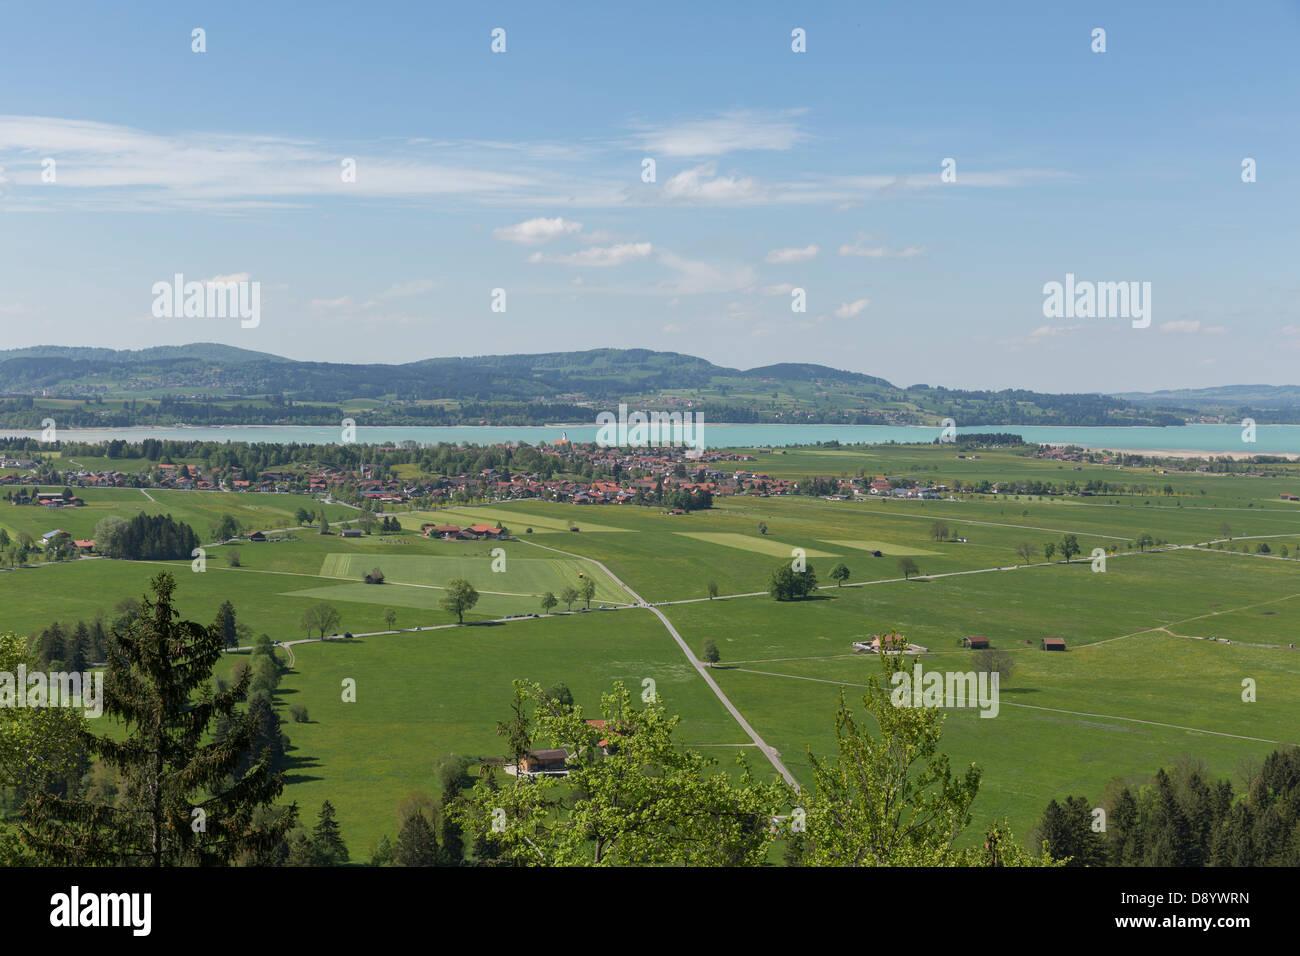 Schwangau landscape - Stock Image